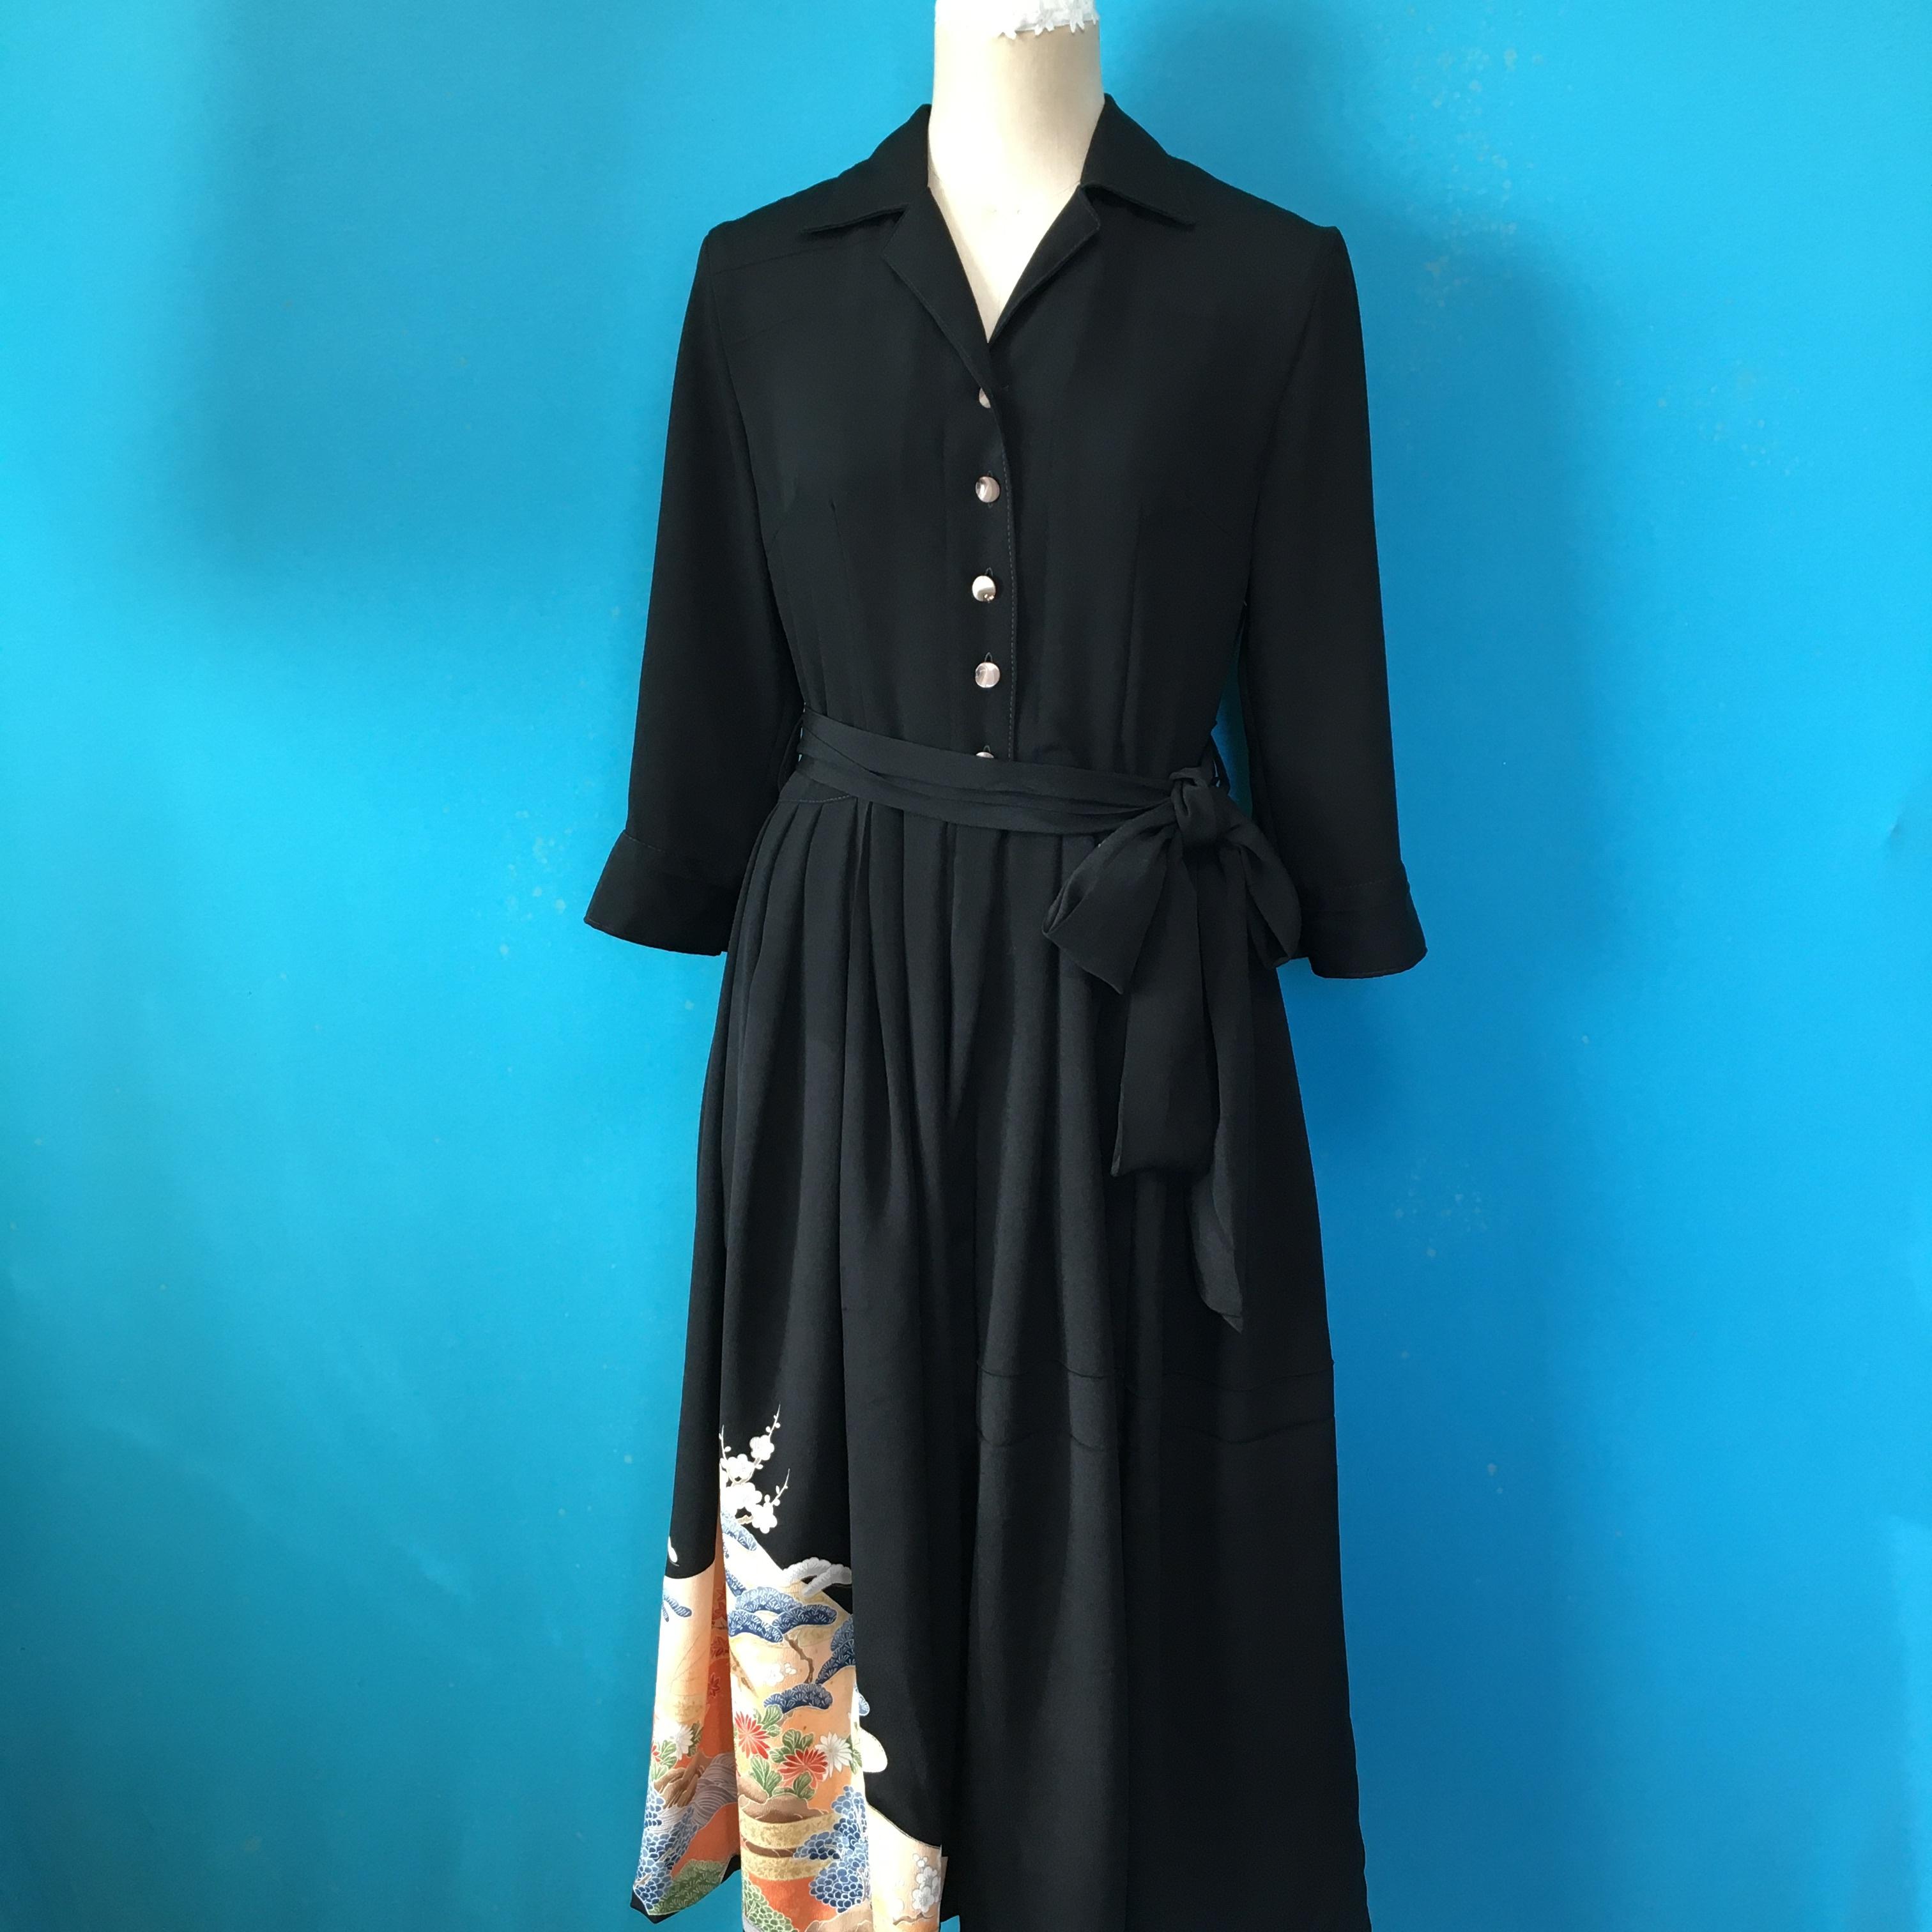 Vintage black dress オープンカラー七分袖